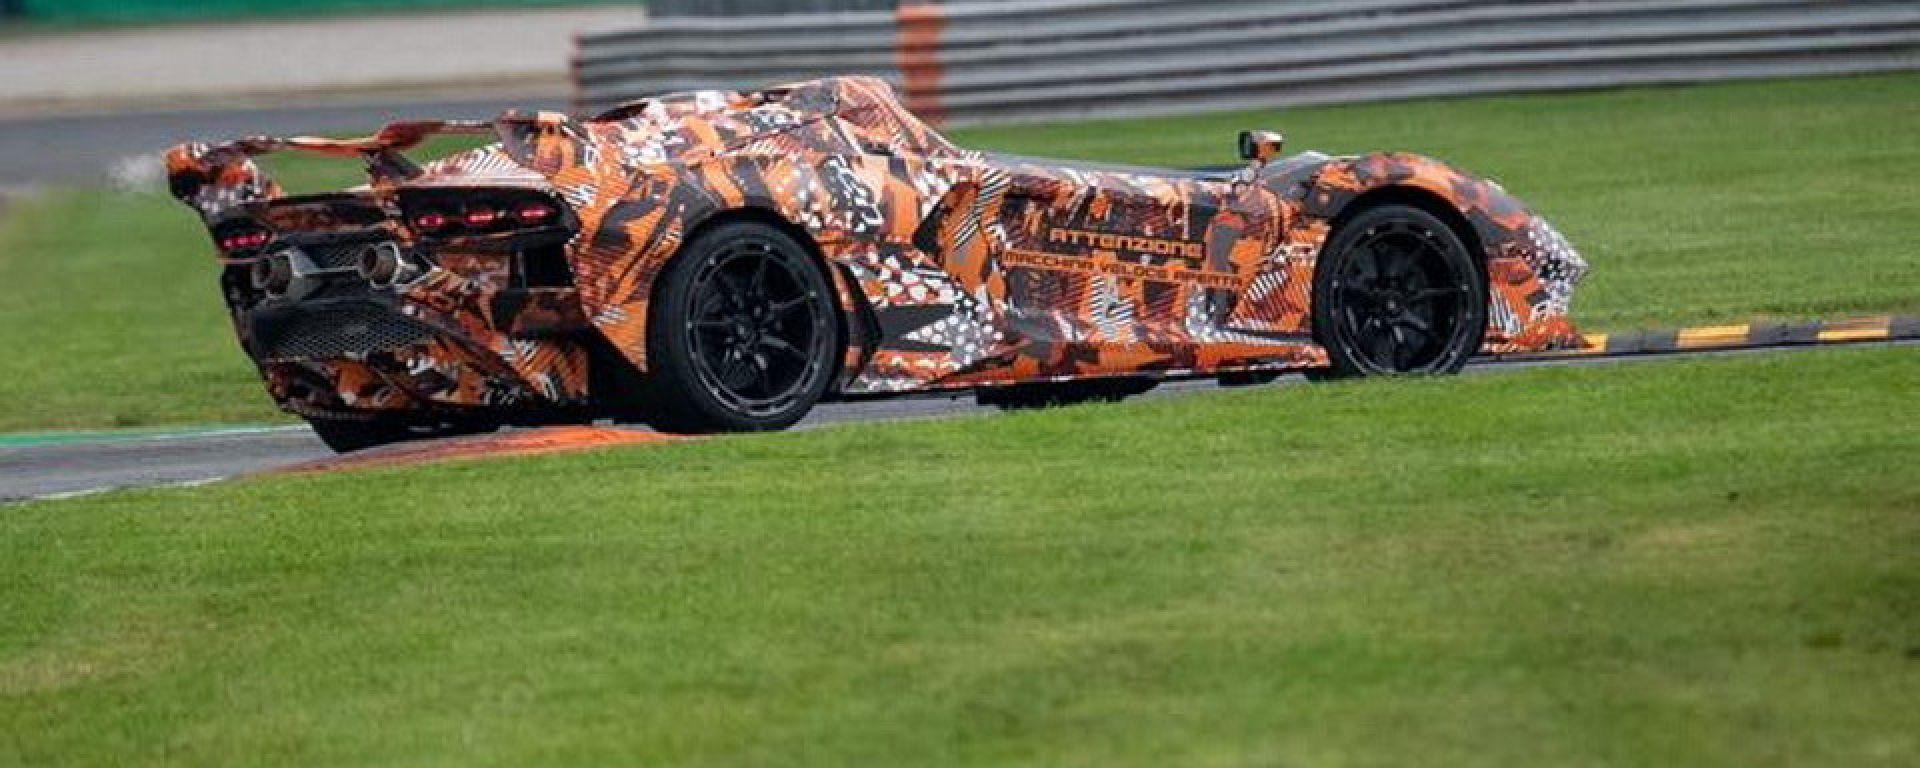 Lamborghini: in arrivo rivale di McLaren Elva e Ferrari Monza?